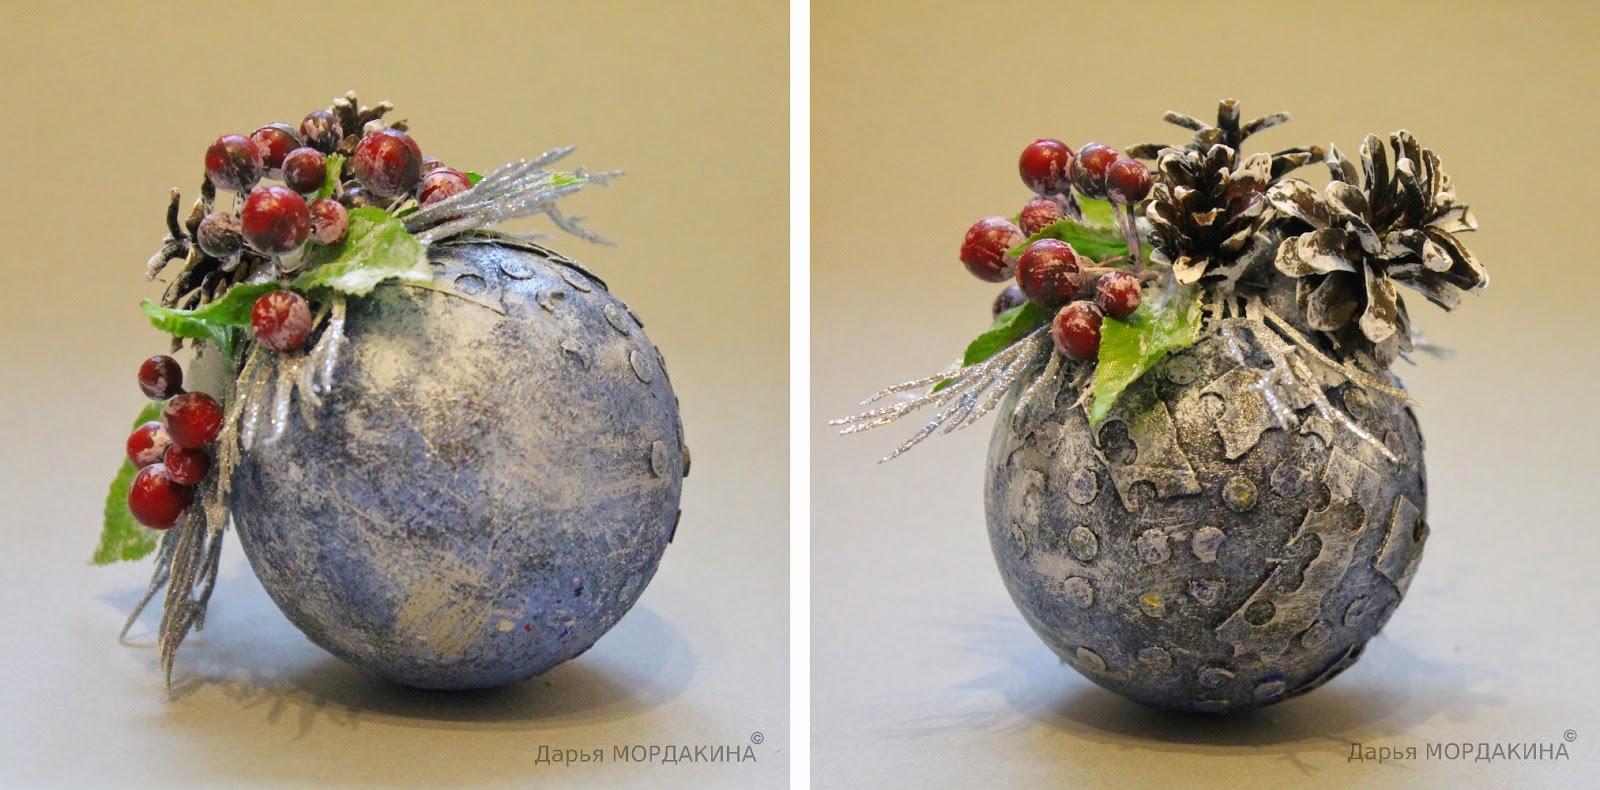 новогодний елочный шарик, елка, праздник, зима, декор, декупаж, шарик, шар, 2015, калина